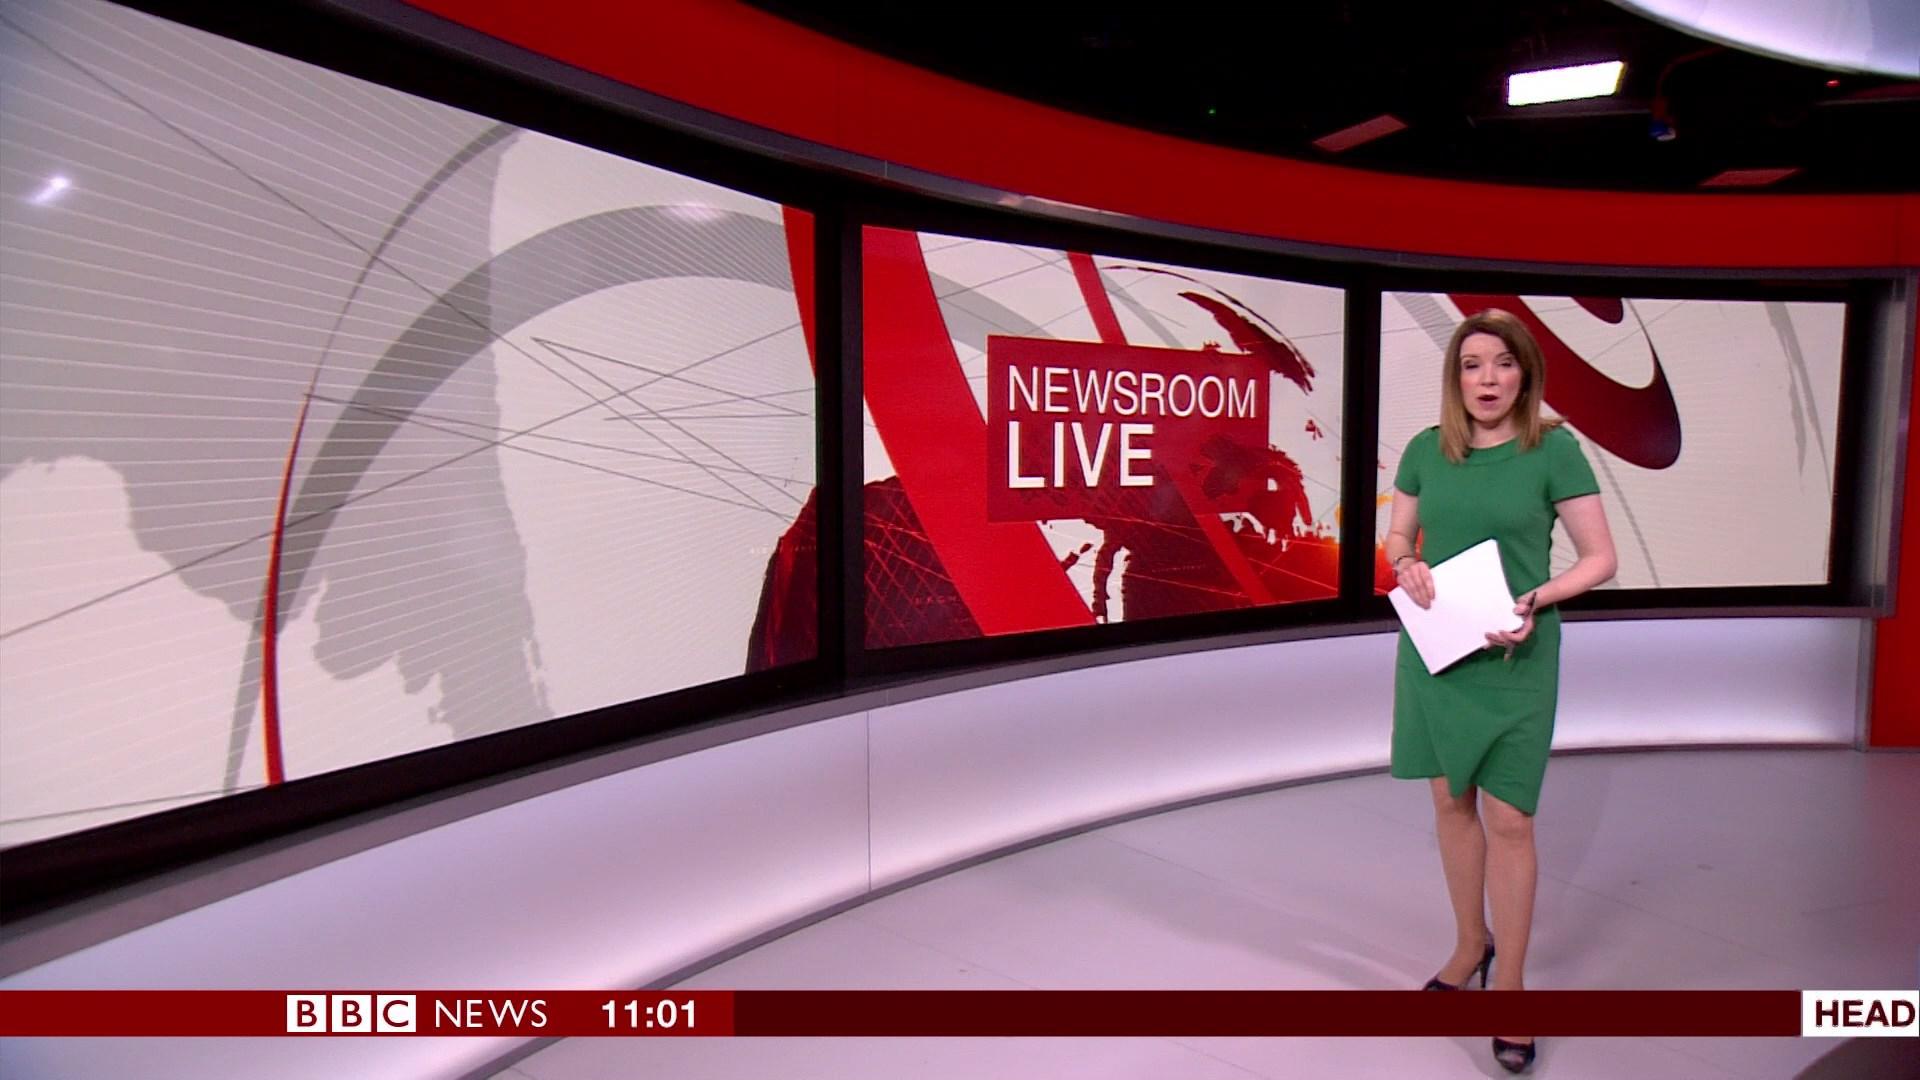 61842114_bbc-newsroom-live_20180117_11001130-ts_snapshot_02-09_-2018-01-17_12-56-31.jpg